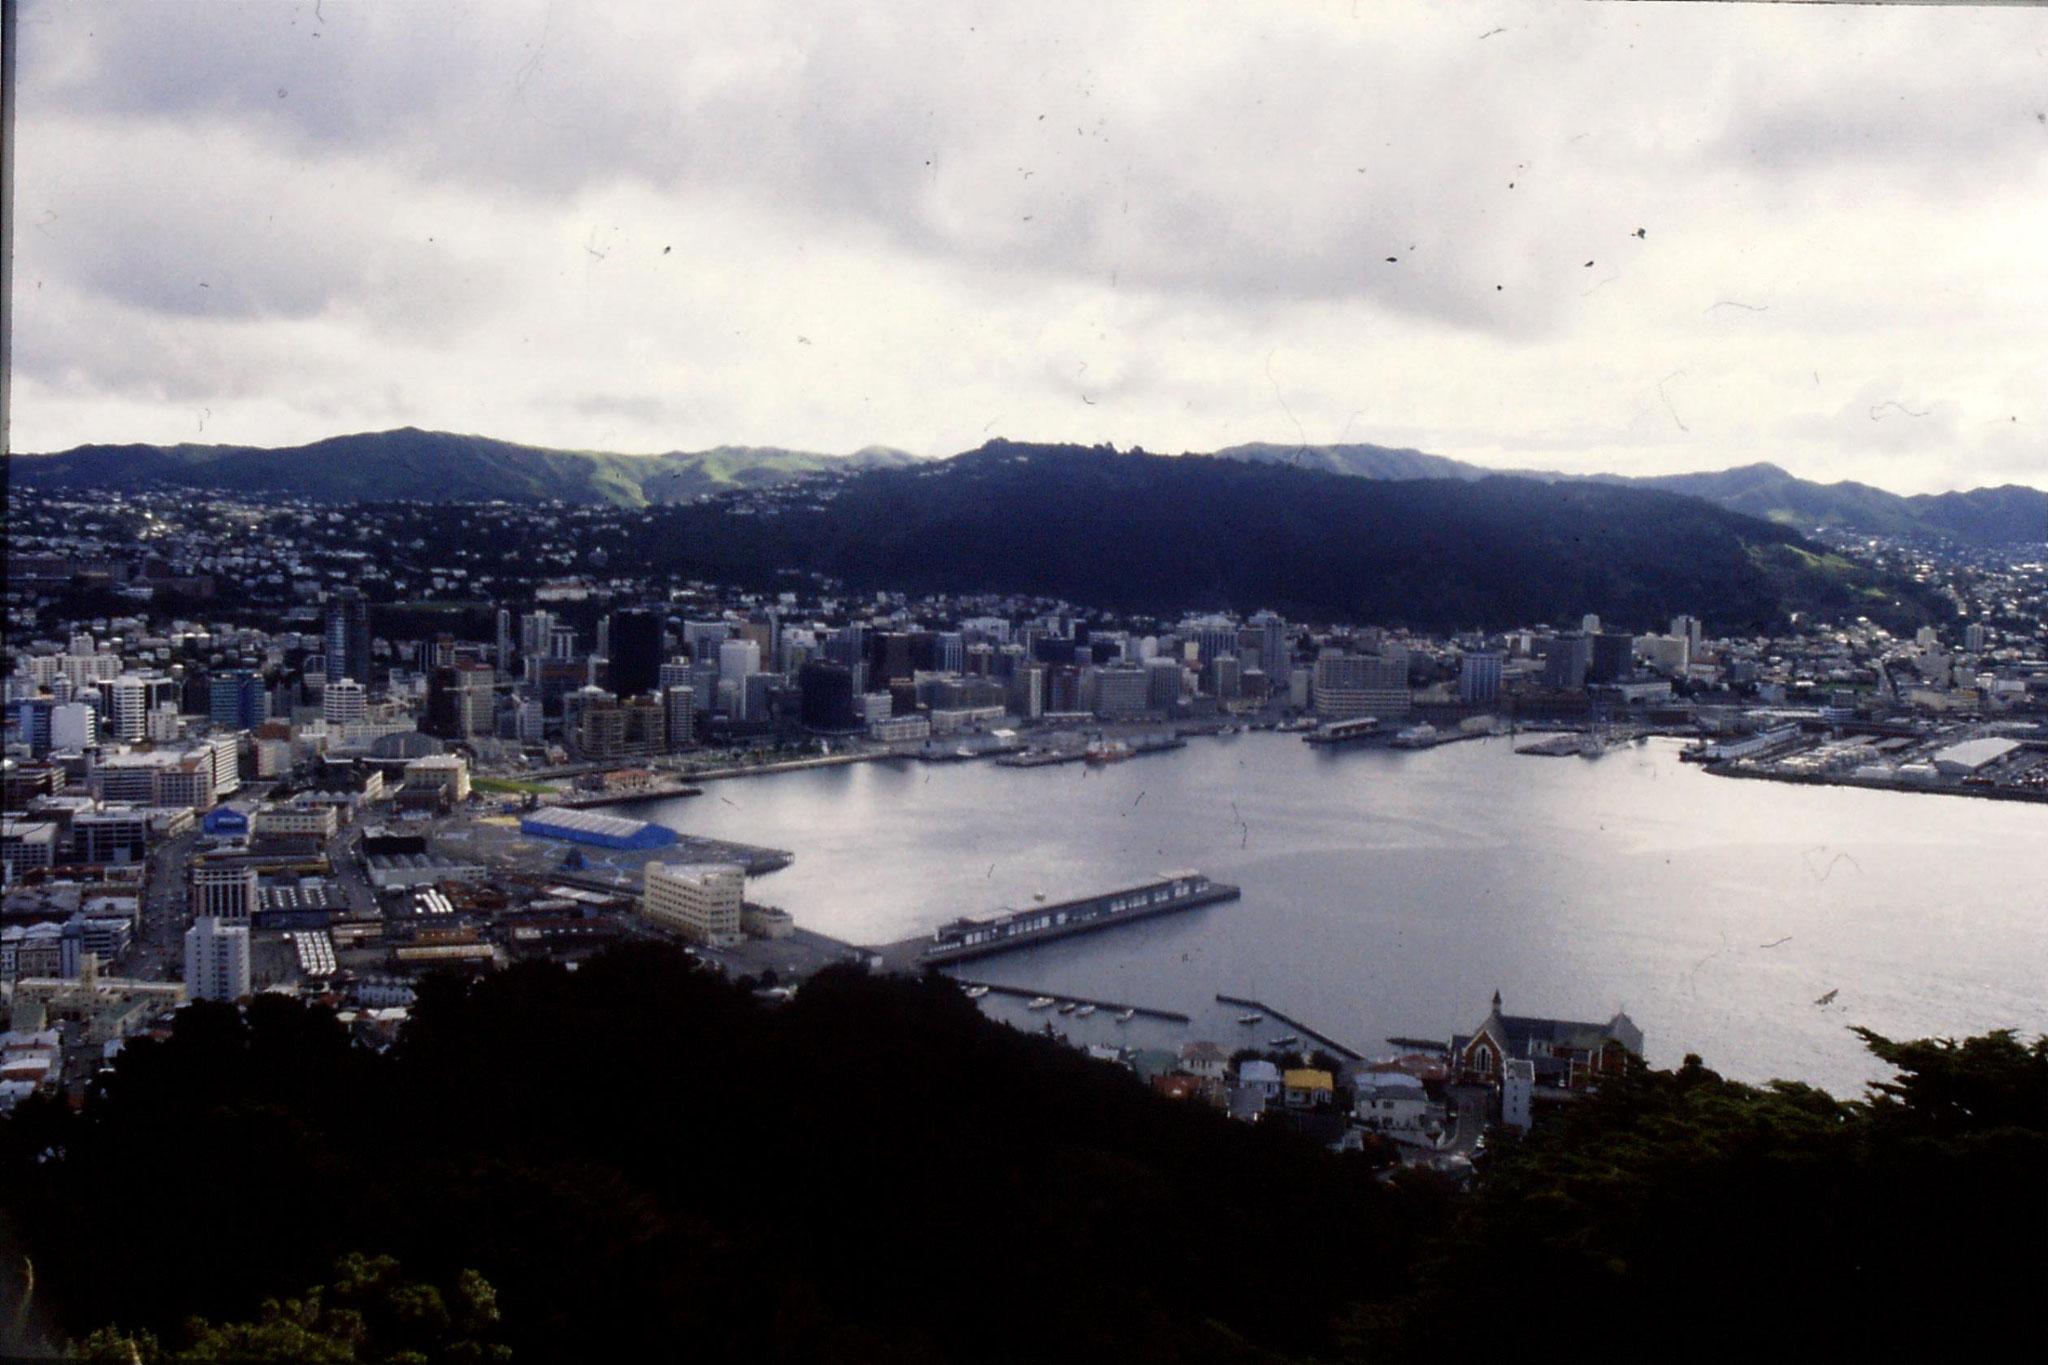 25/8/1990: 9: Wellington